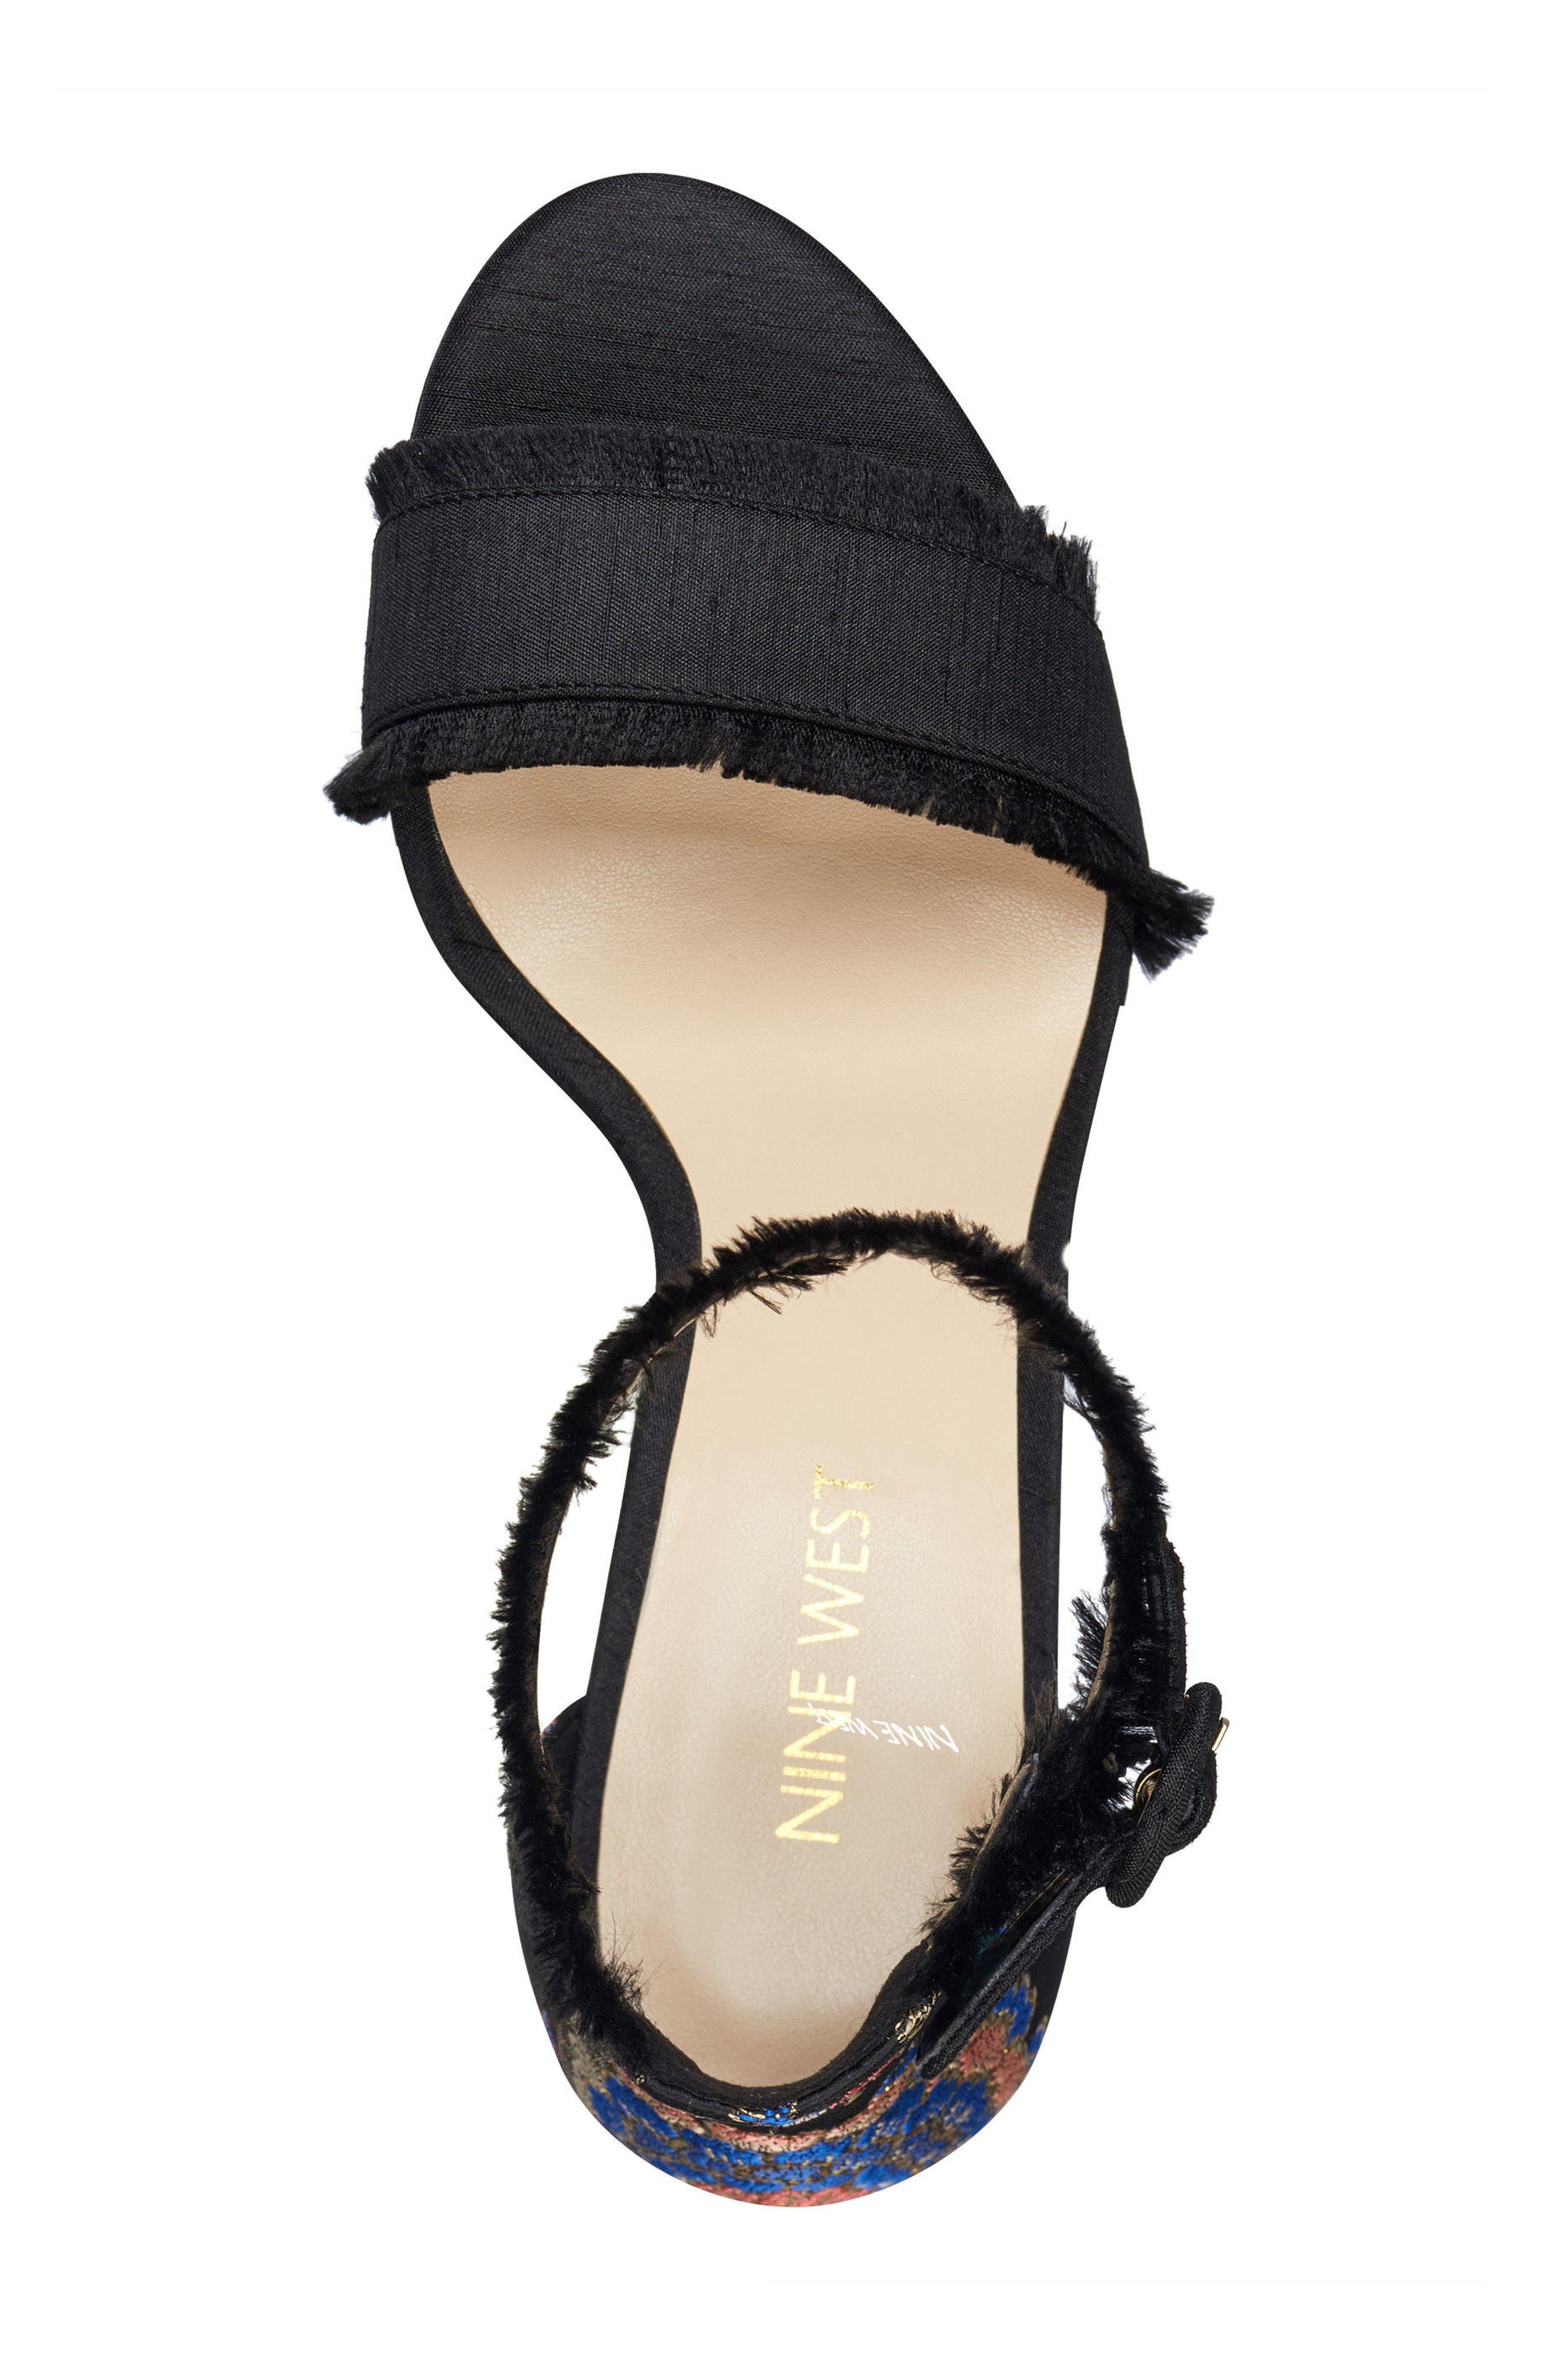 Daranita Ankle Strap Sandal,                             Alternate thumbnail 5, color,                             Black/ Black Multi Fabric